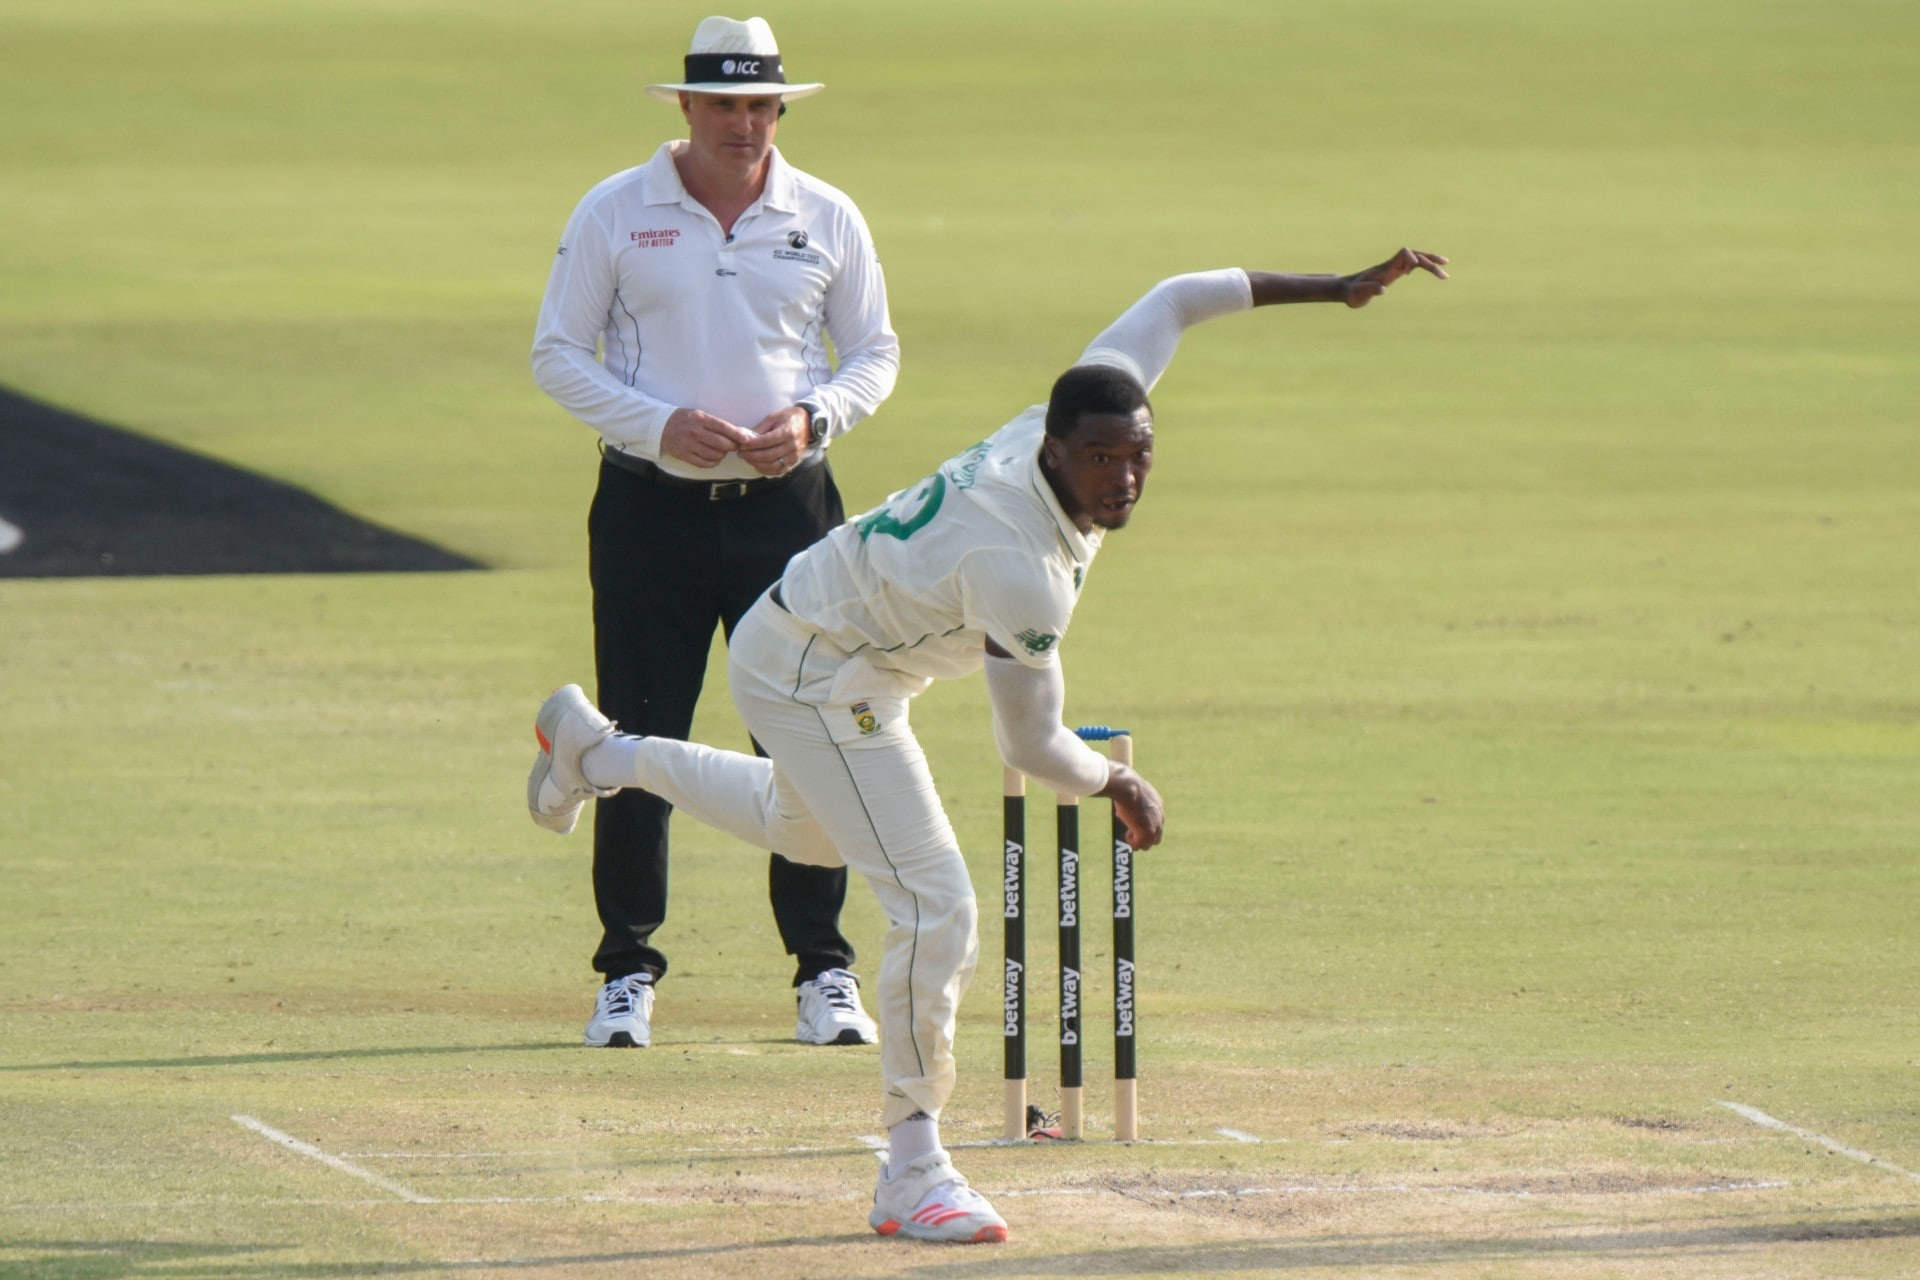 South Africa vs Sri Lanka, 1st Test, Day 4 Highlights: SA Win by Inns & 45 Runs